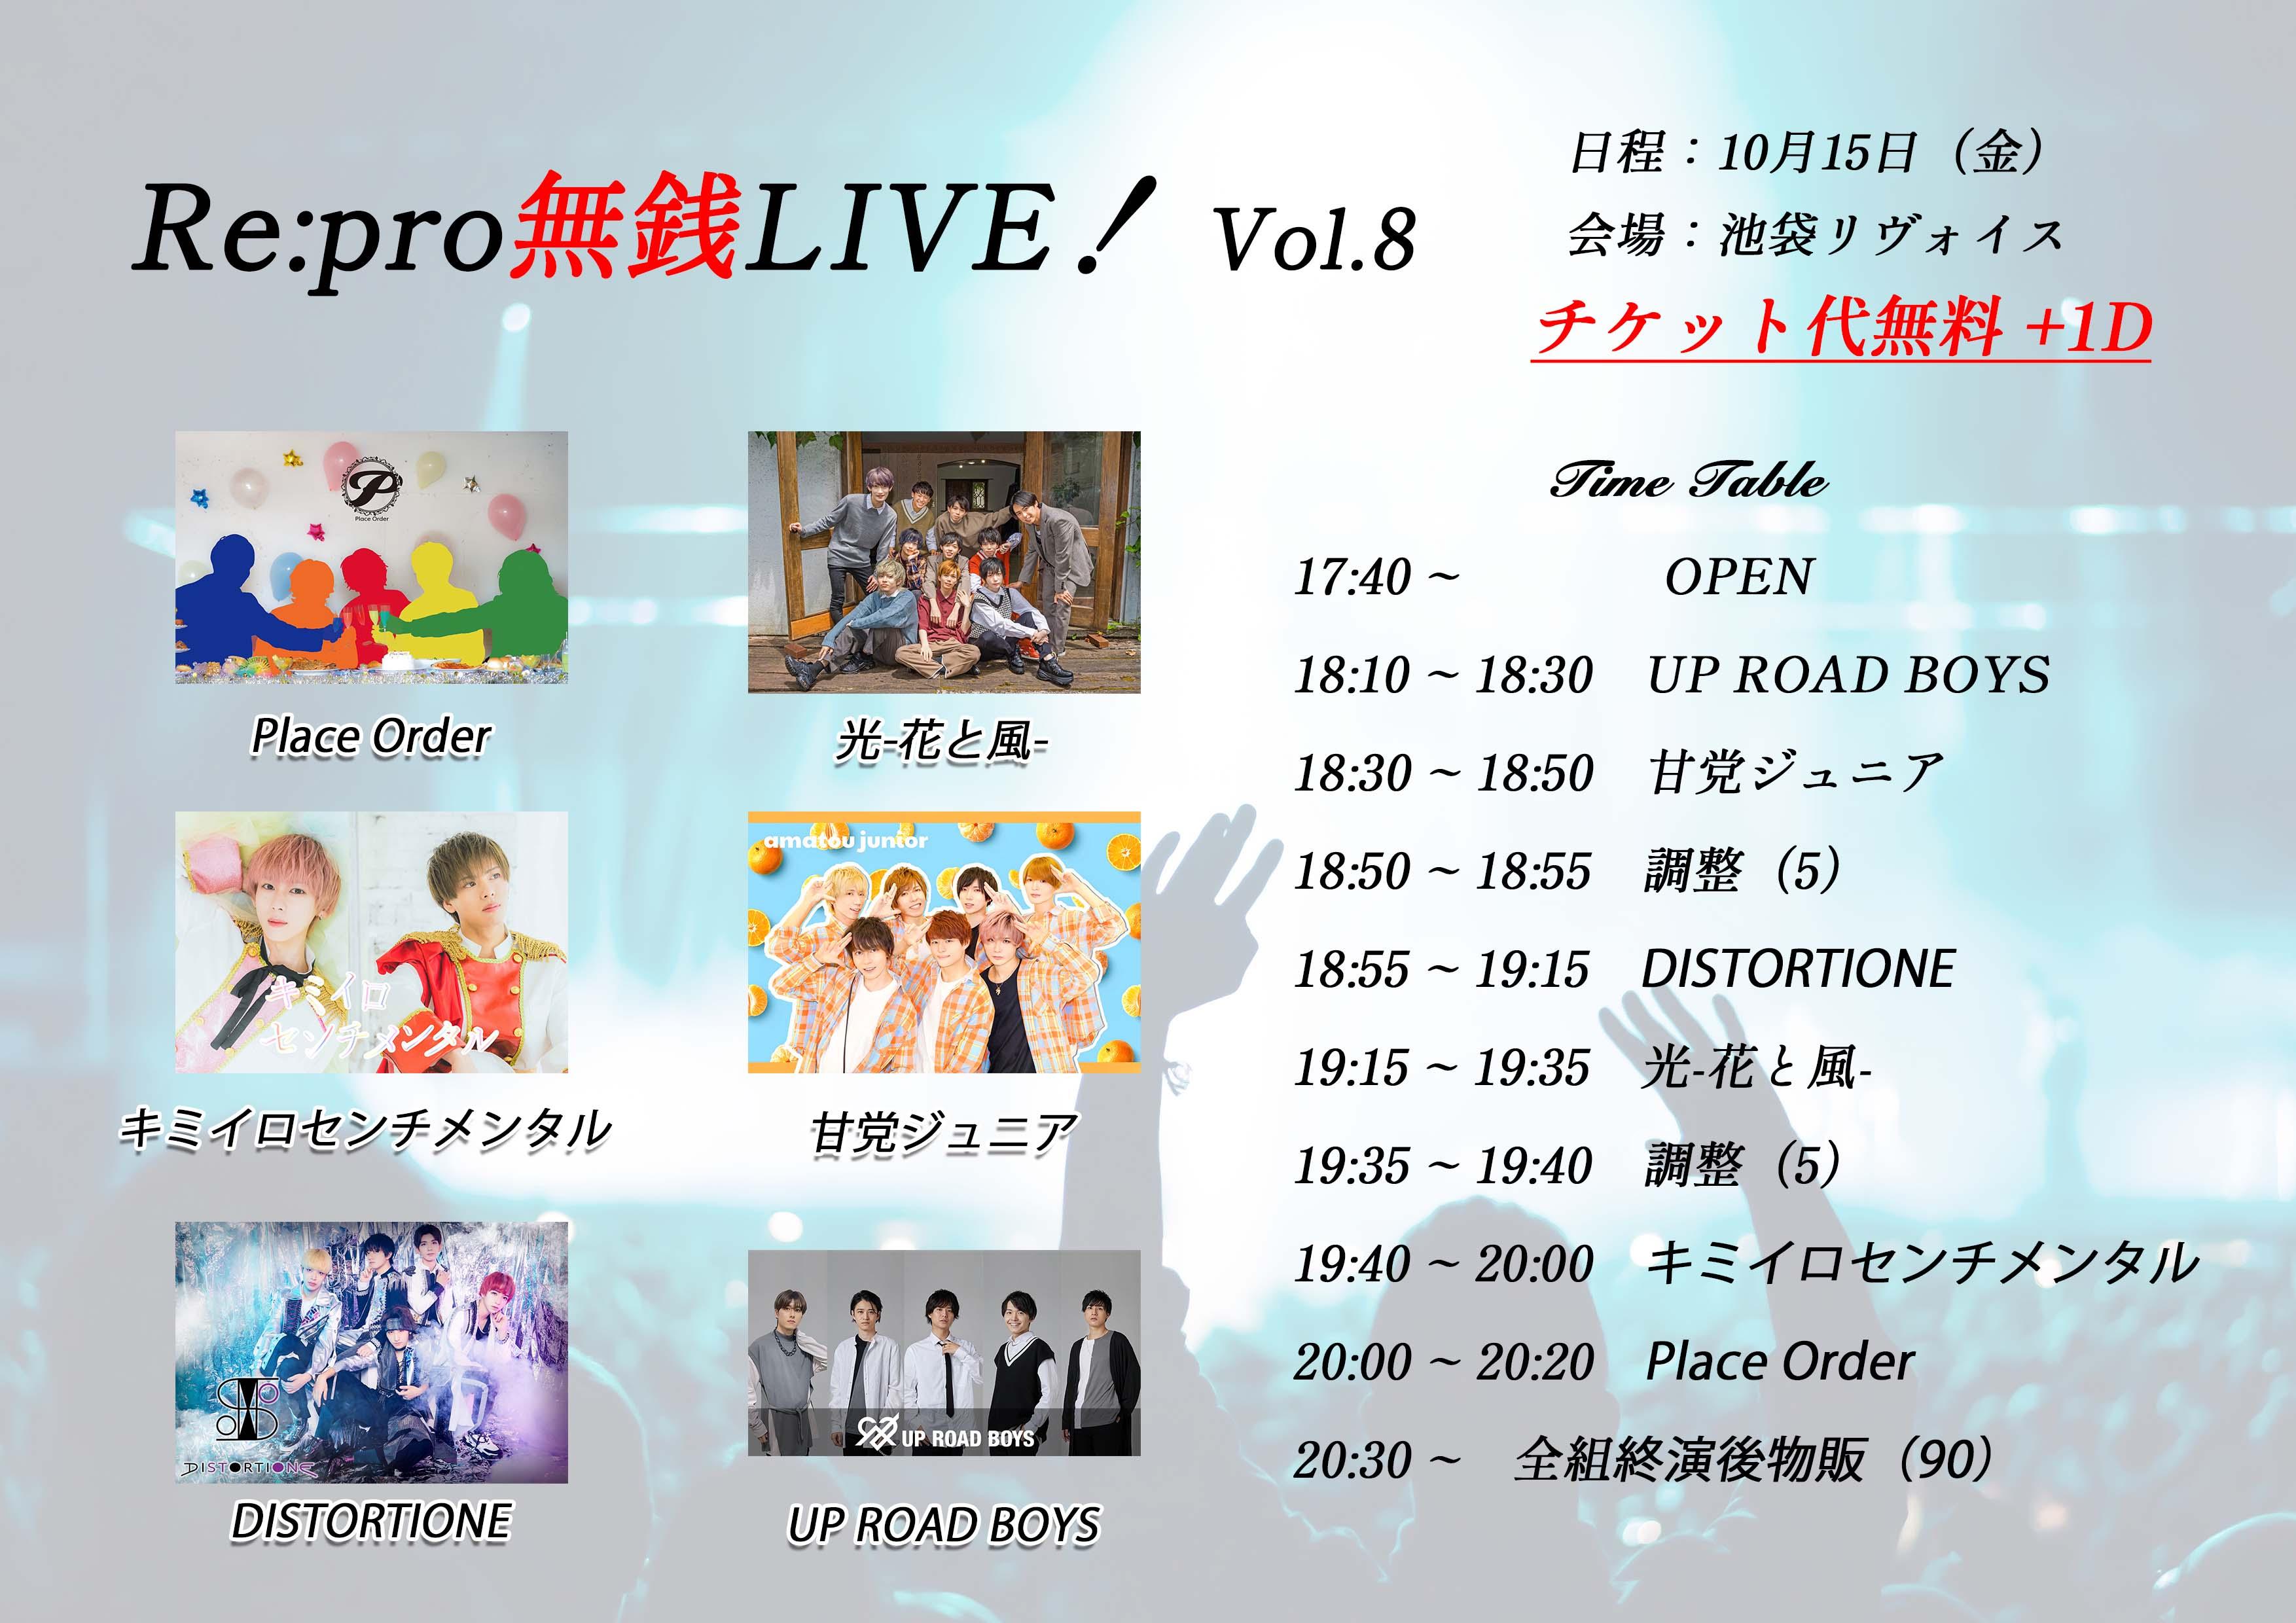 Re:pro無銭LIVE! Vol.8